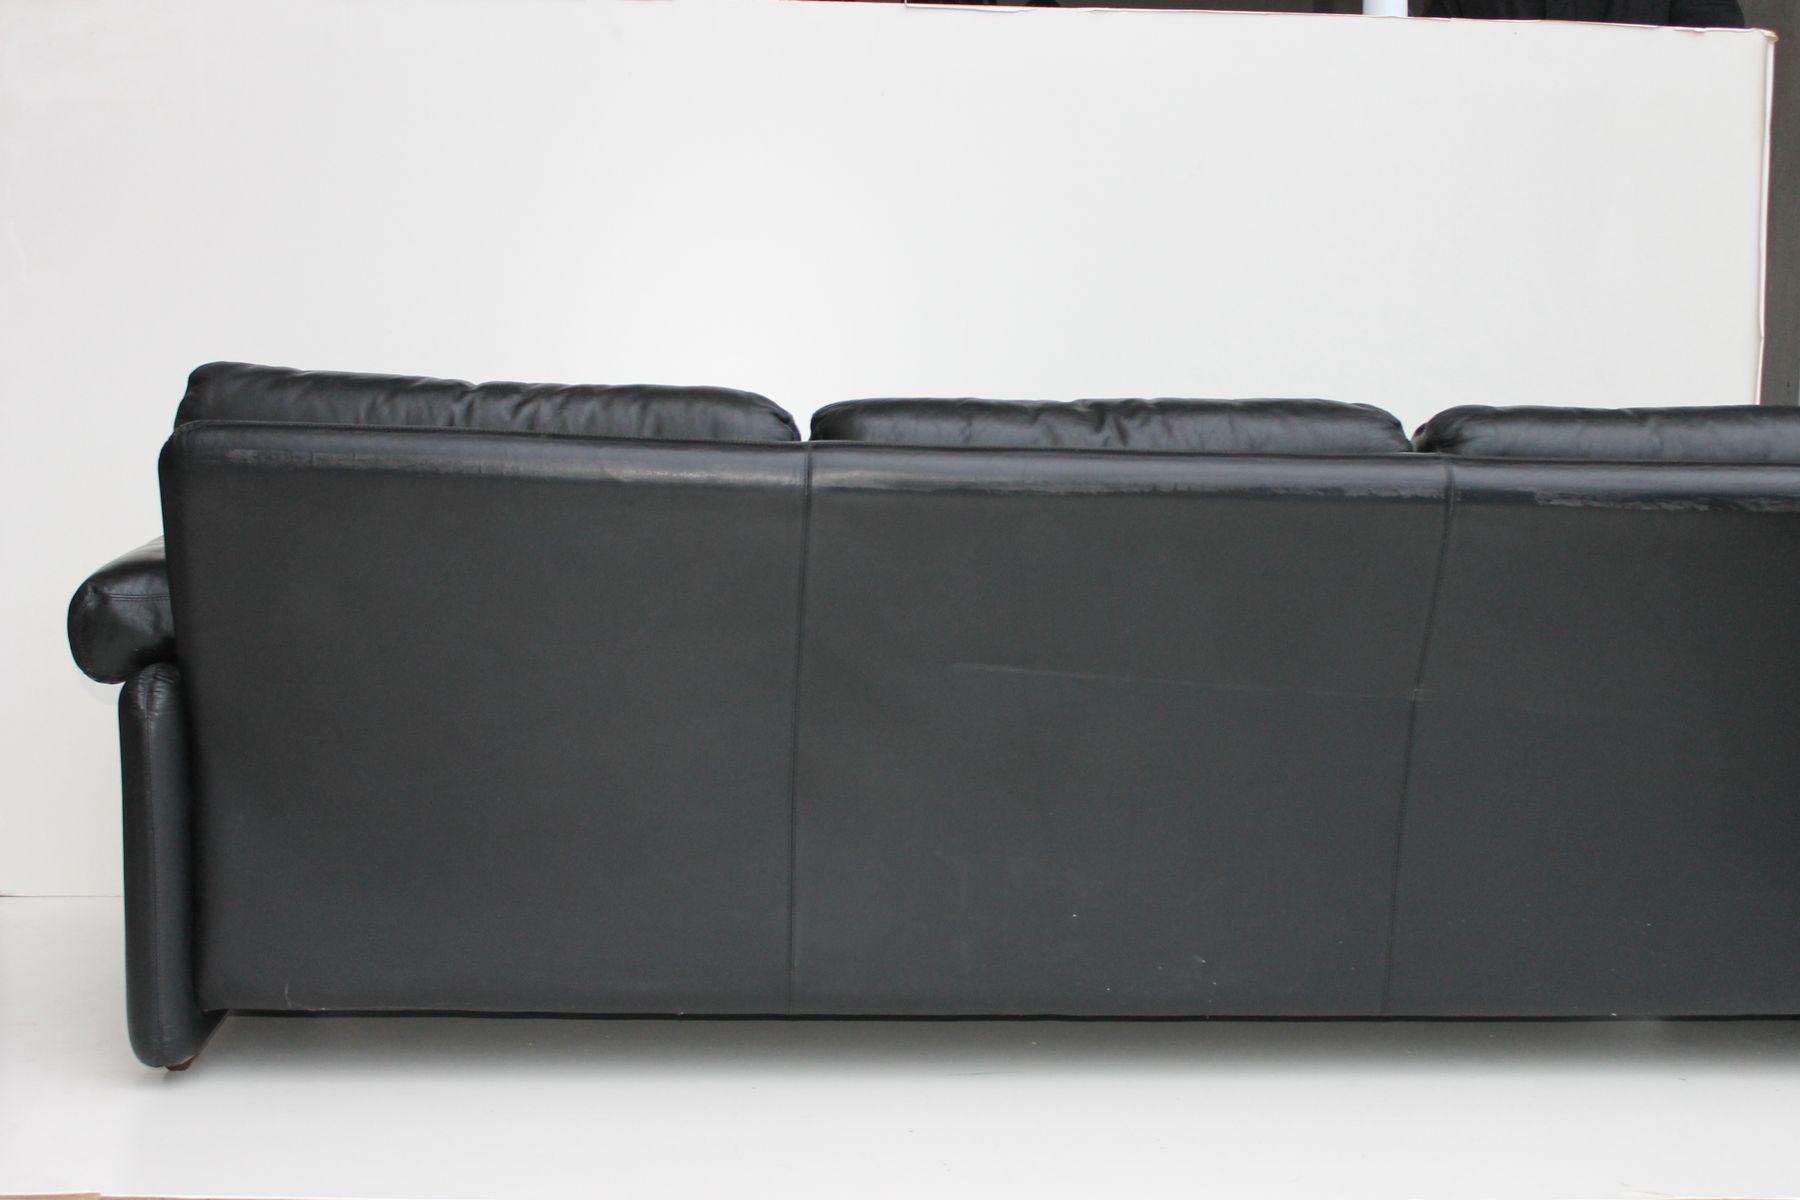 Coronado Black Leather Sofa By Tobia Scarpa For B B Italia 1970s For Sale At Pamono